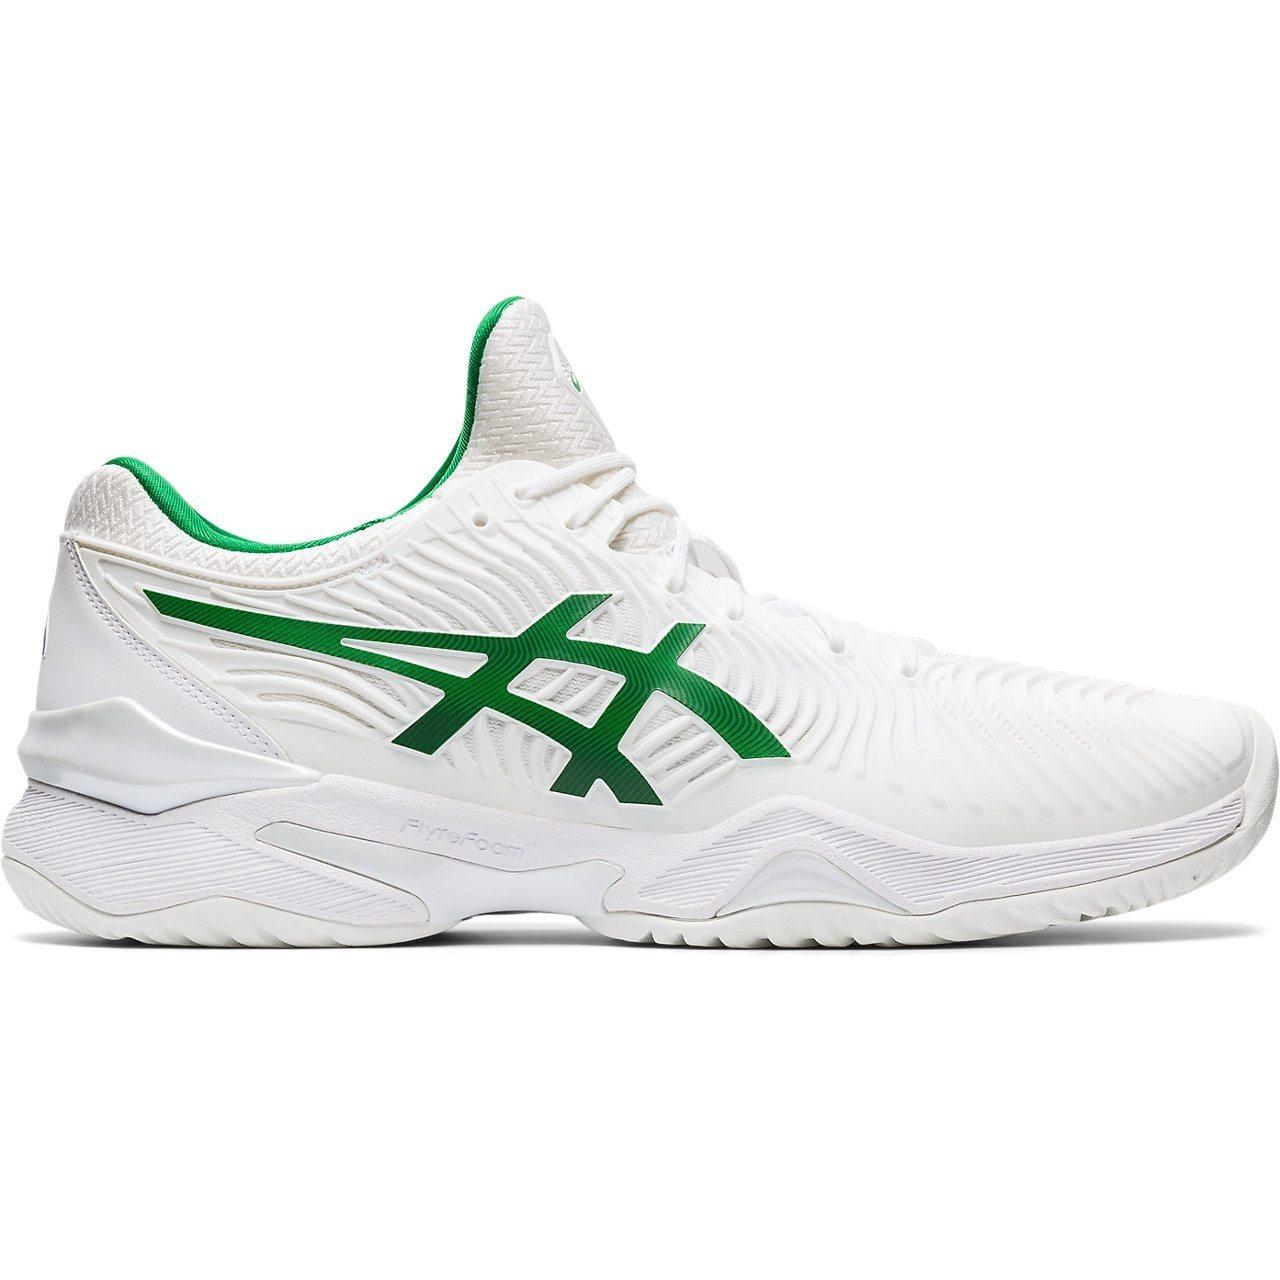 Asics-Court-FF-2-Novak-Djokovic-Men-039-s-Tennis-Shoes-Sneakers-White-Green thumbnail 8